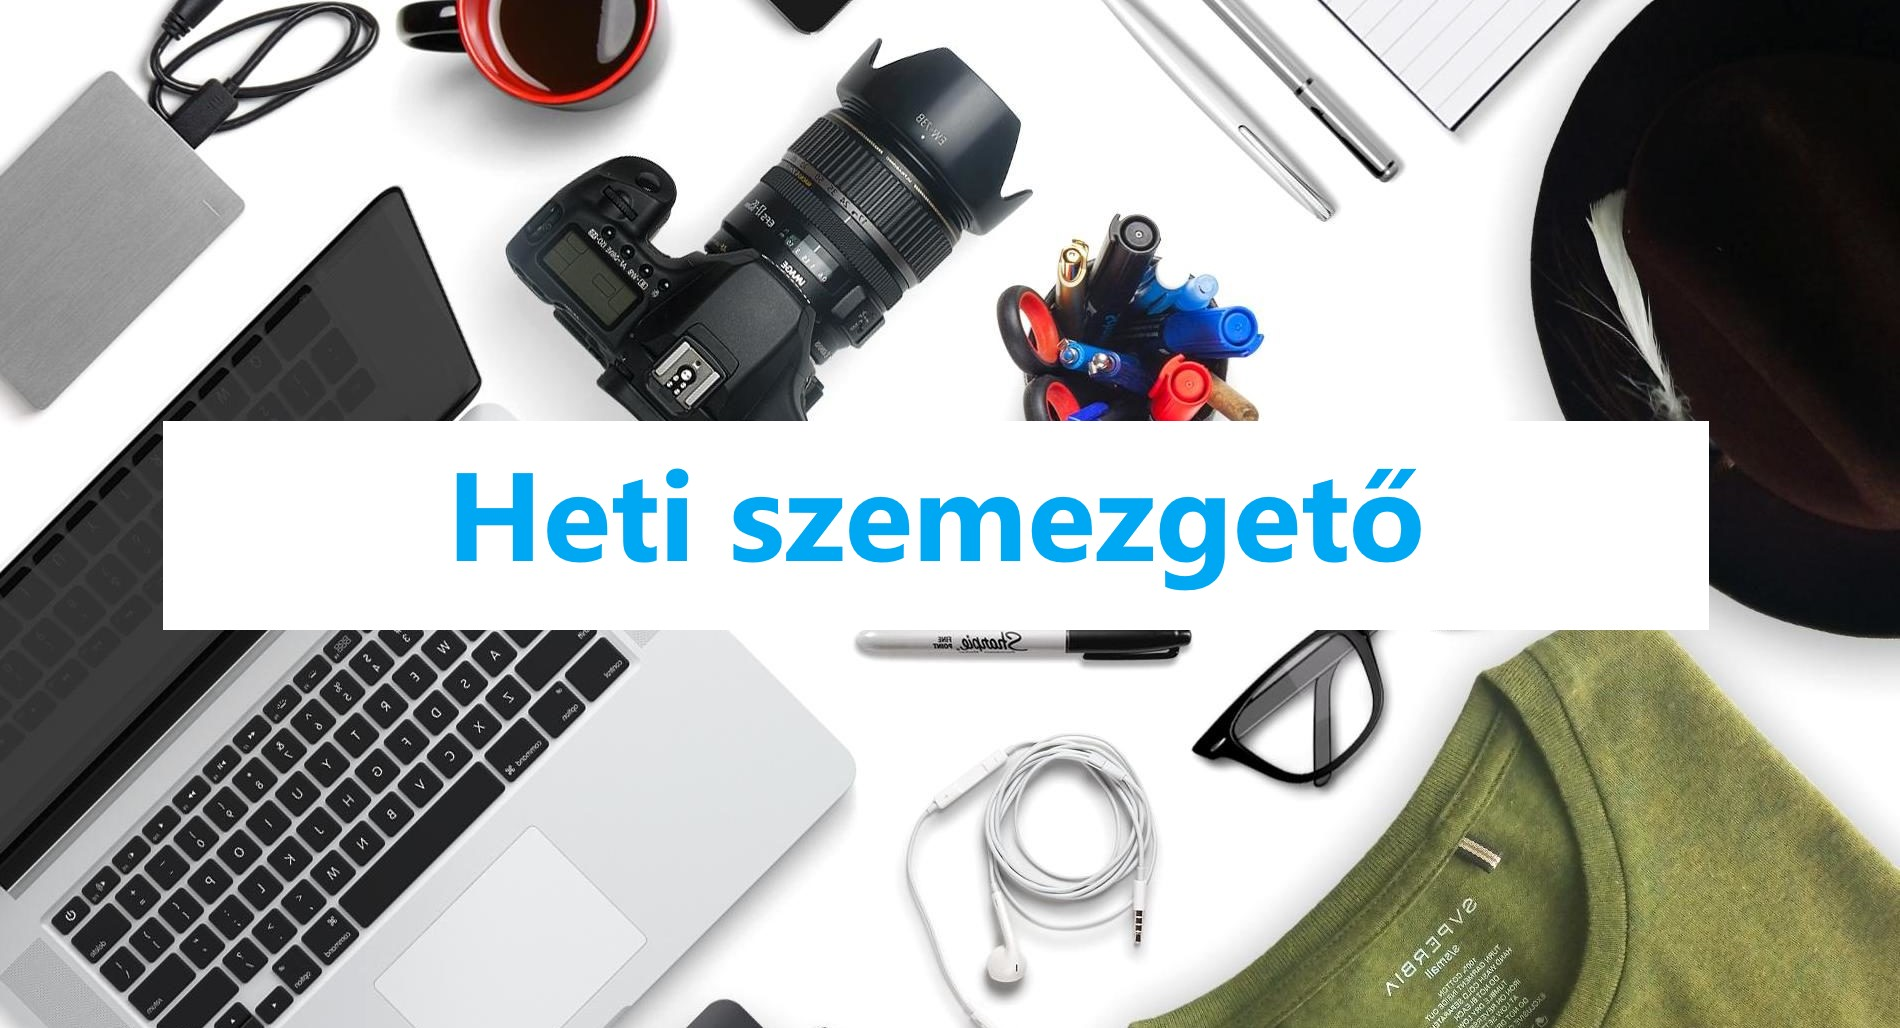 heti_szemezgeto_uj_97.jpg